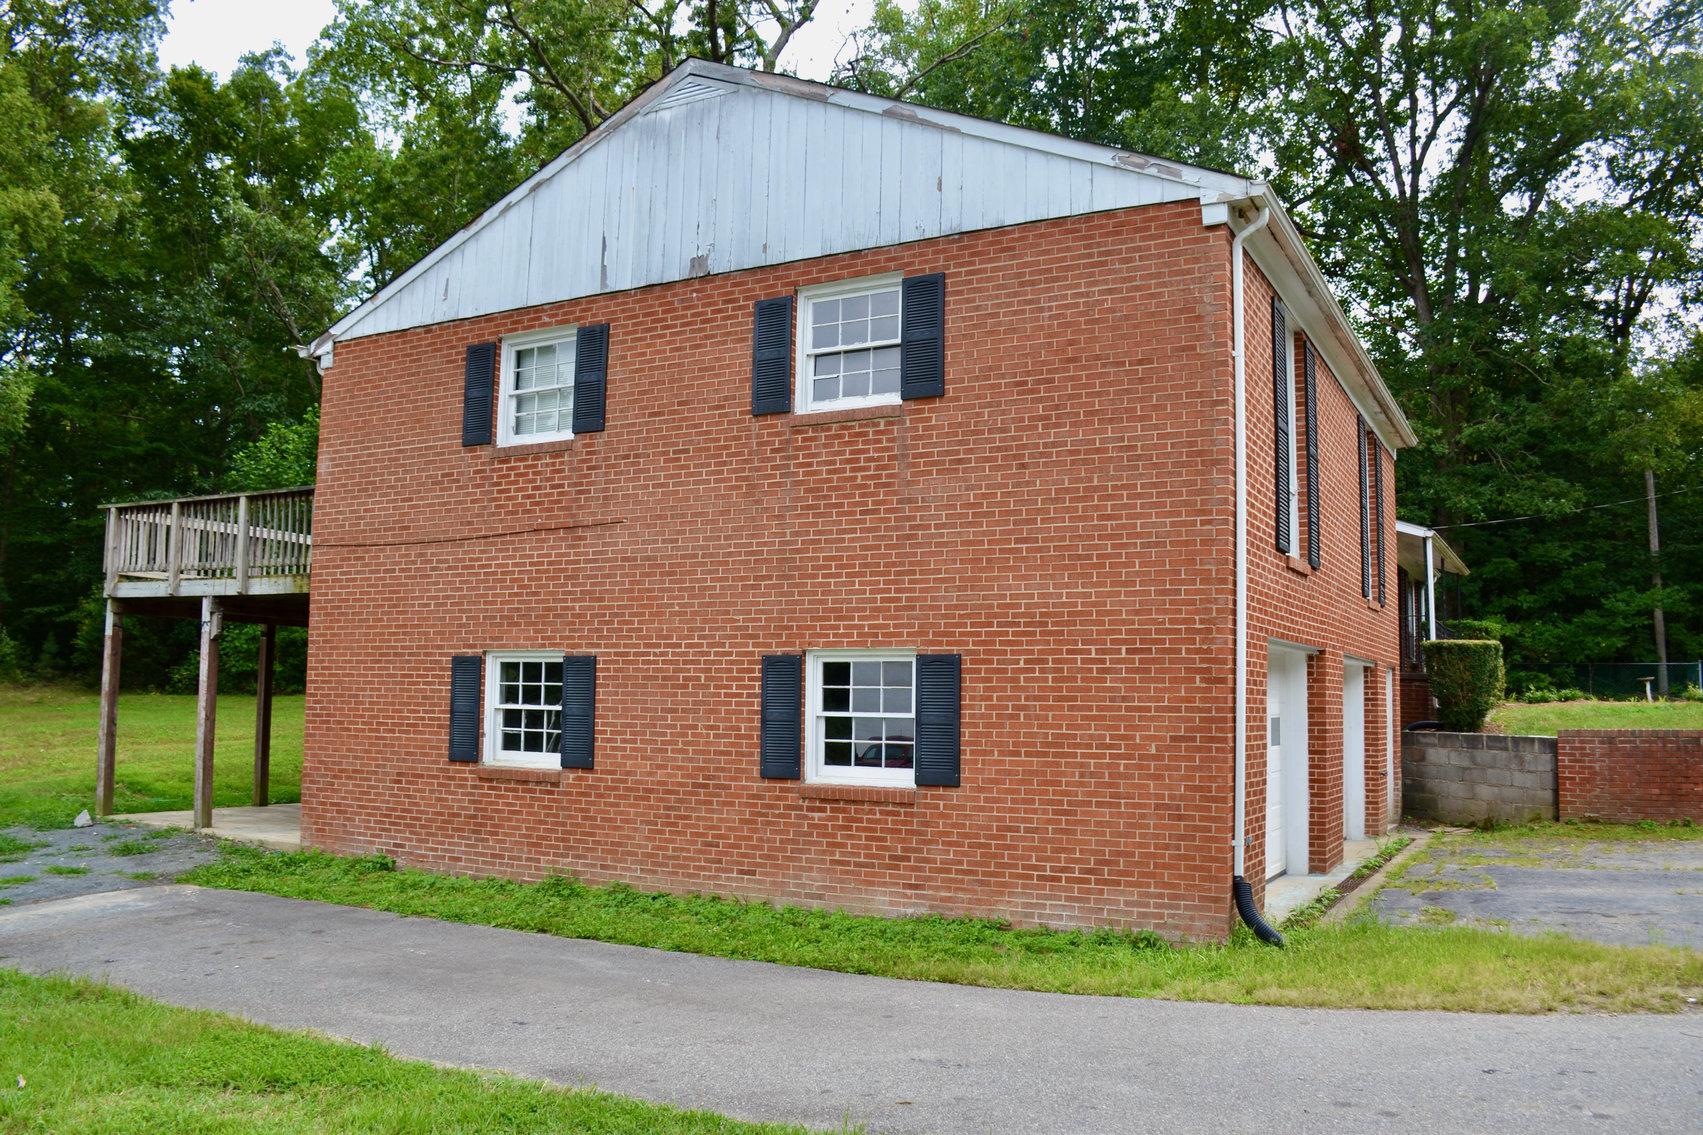 Image for 5 BR/2 Full & 2 Half BA Brick Home on 1 +/- Acres Centrally Located in Spotsylvania County, VA